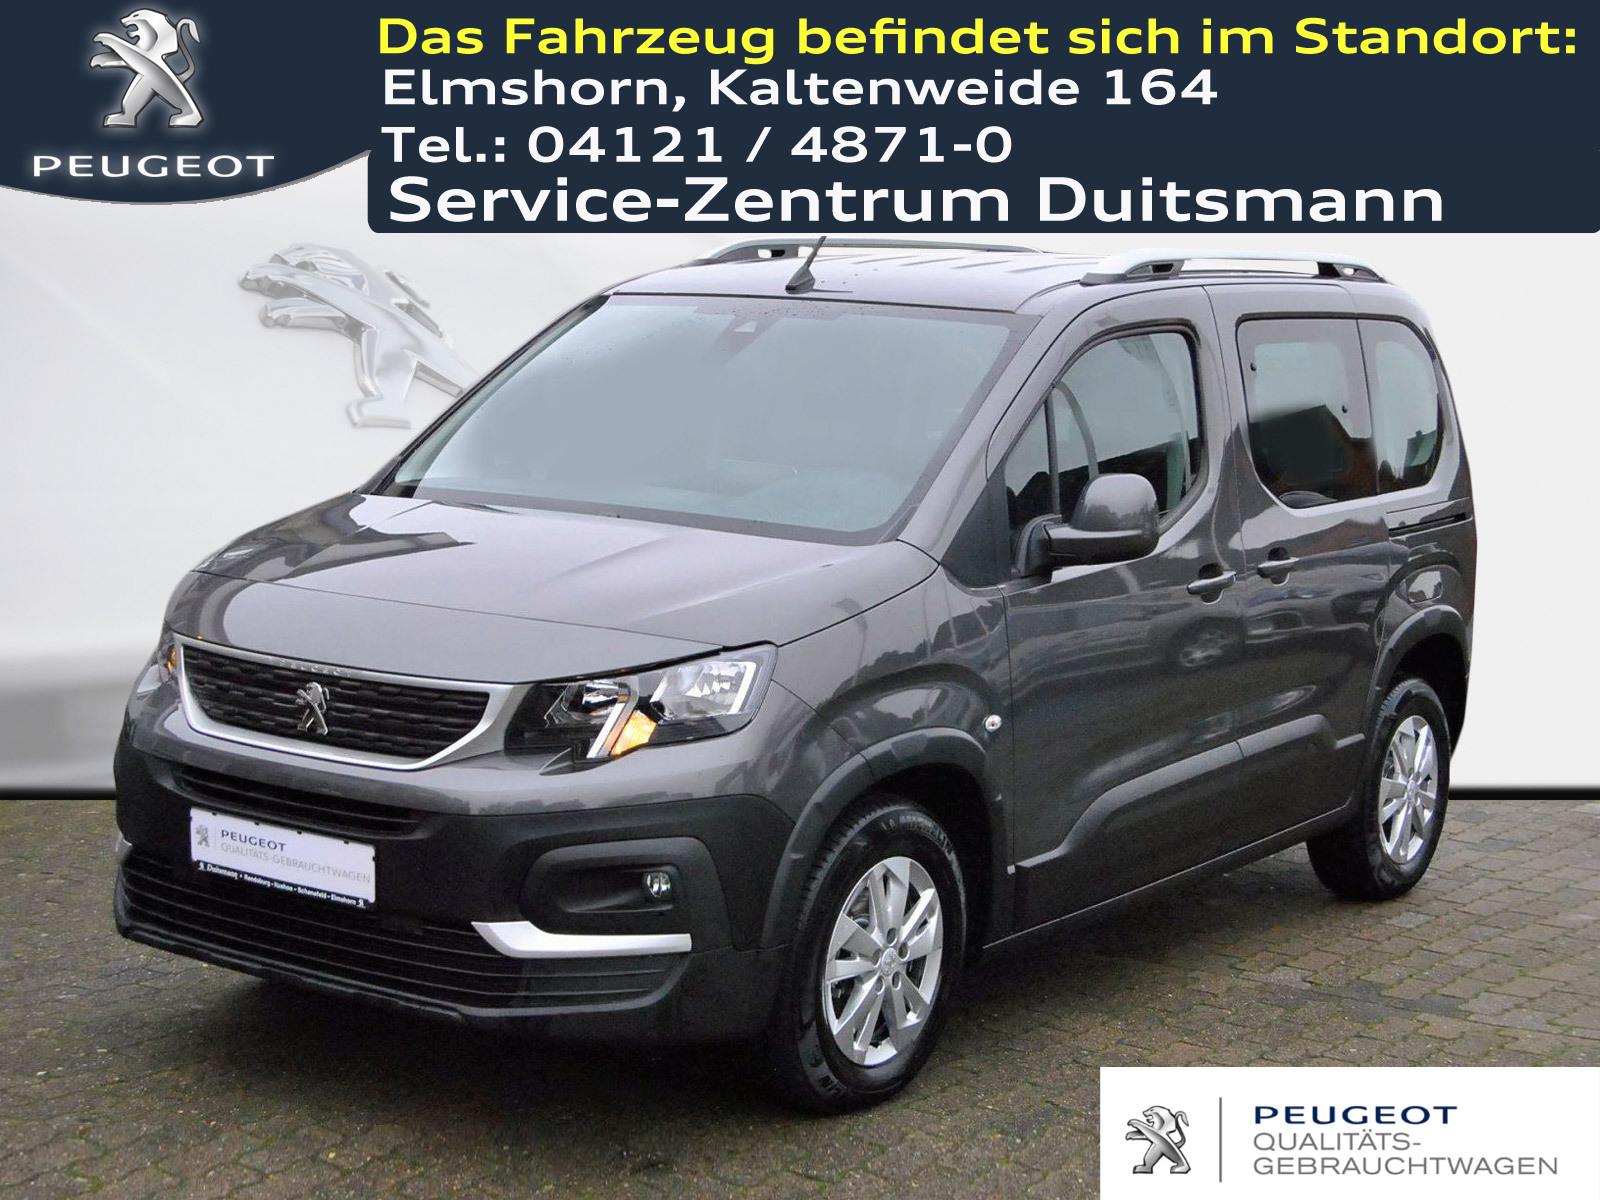 Peugeot Rifter BlueHDI 100 Active++KLIMAAUTOMATIK++NAVI, Jahr 2020, Diesel